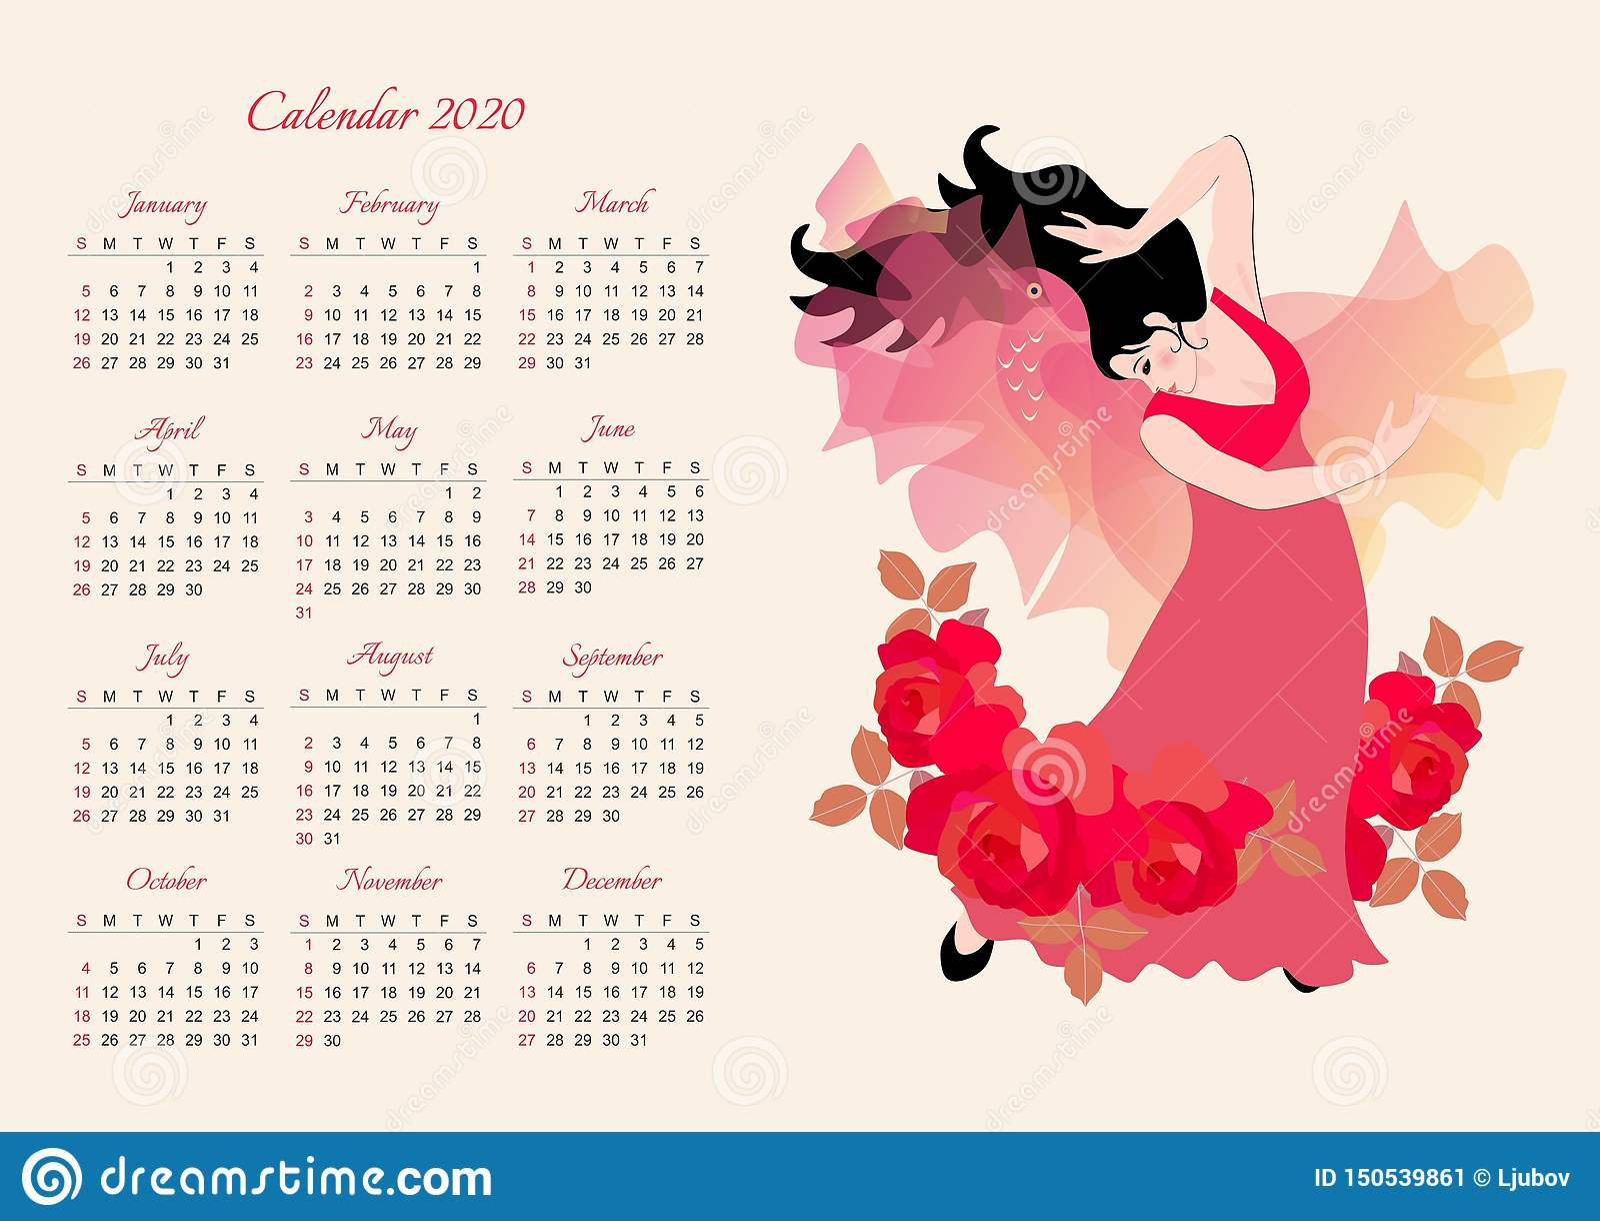 Decorated February Calendars 2020 Calendar Template For 2020 Year. Beautiful Girl In A Long Dress